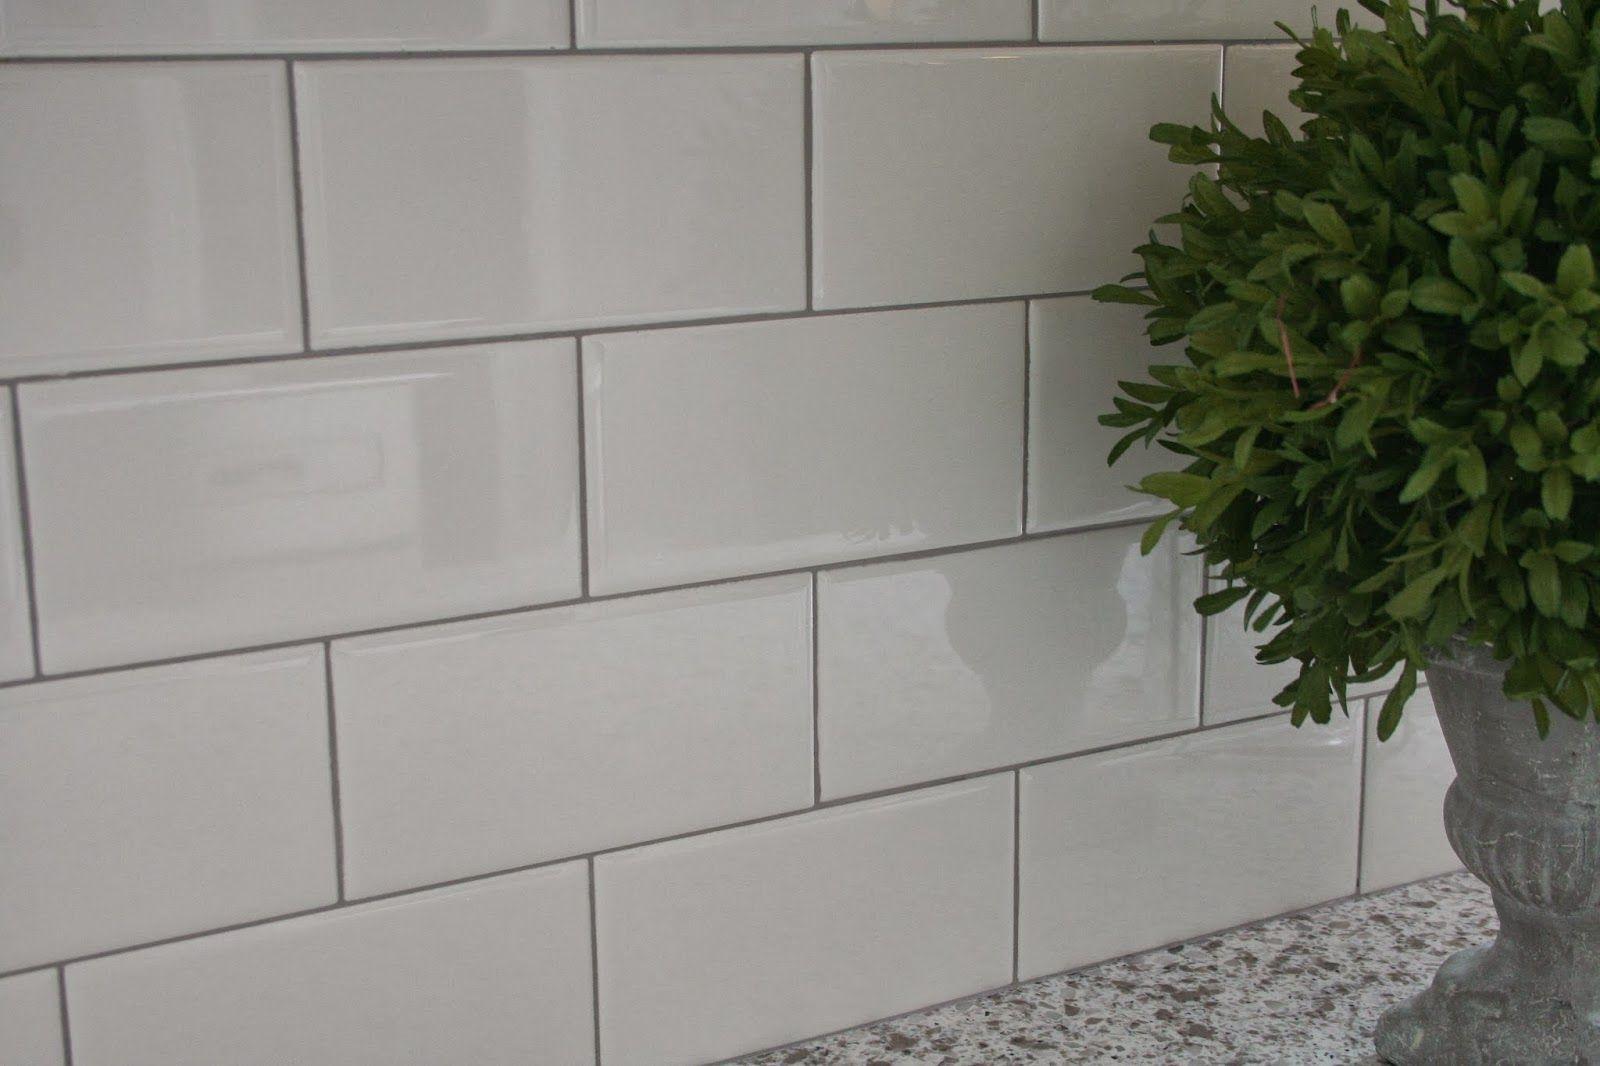 Delorean Gray Grout With White Subway Tile White Subway Tile